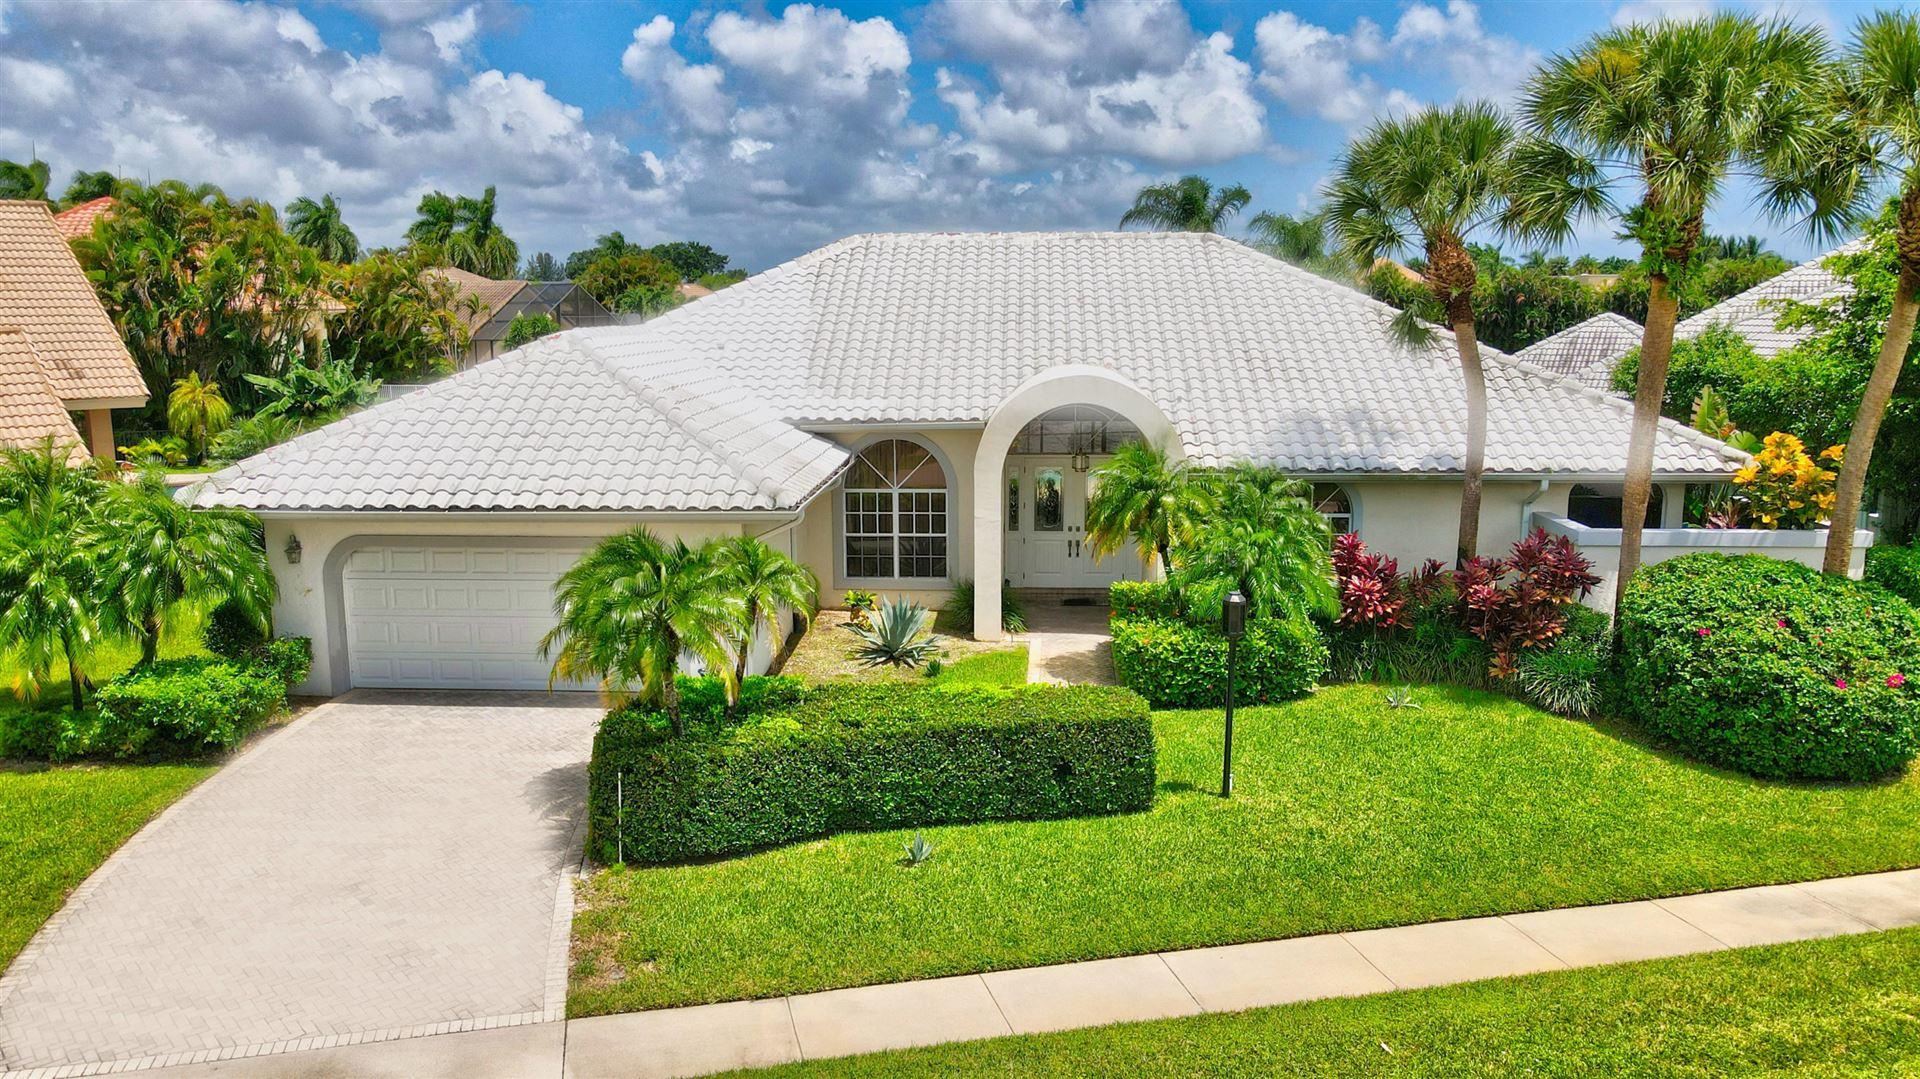 10739 Stonebridge Boulevard, Boca Raton, FL 33498 - #: RX-10651269